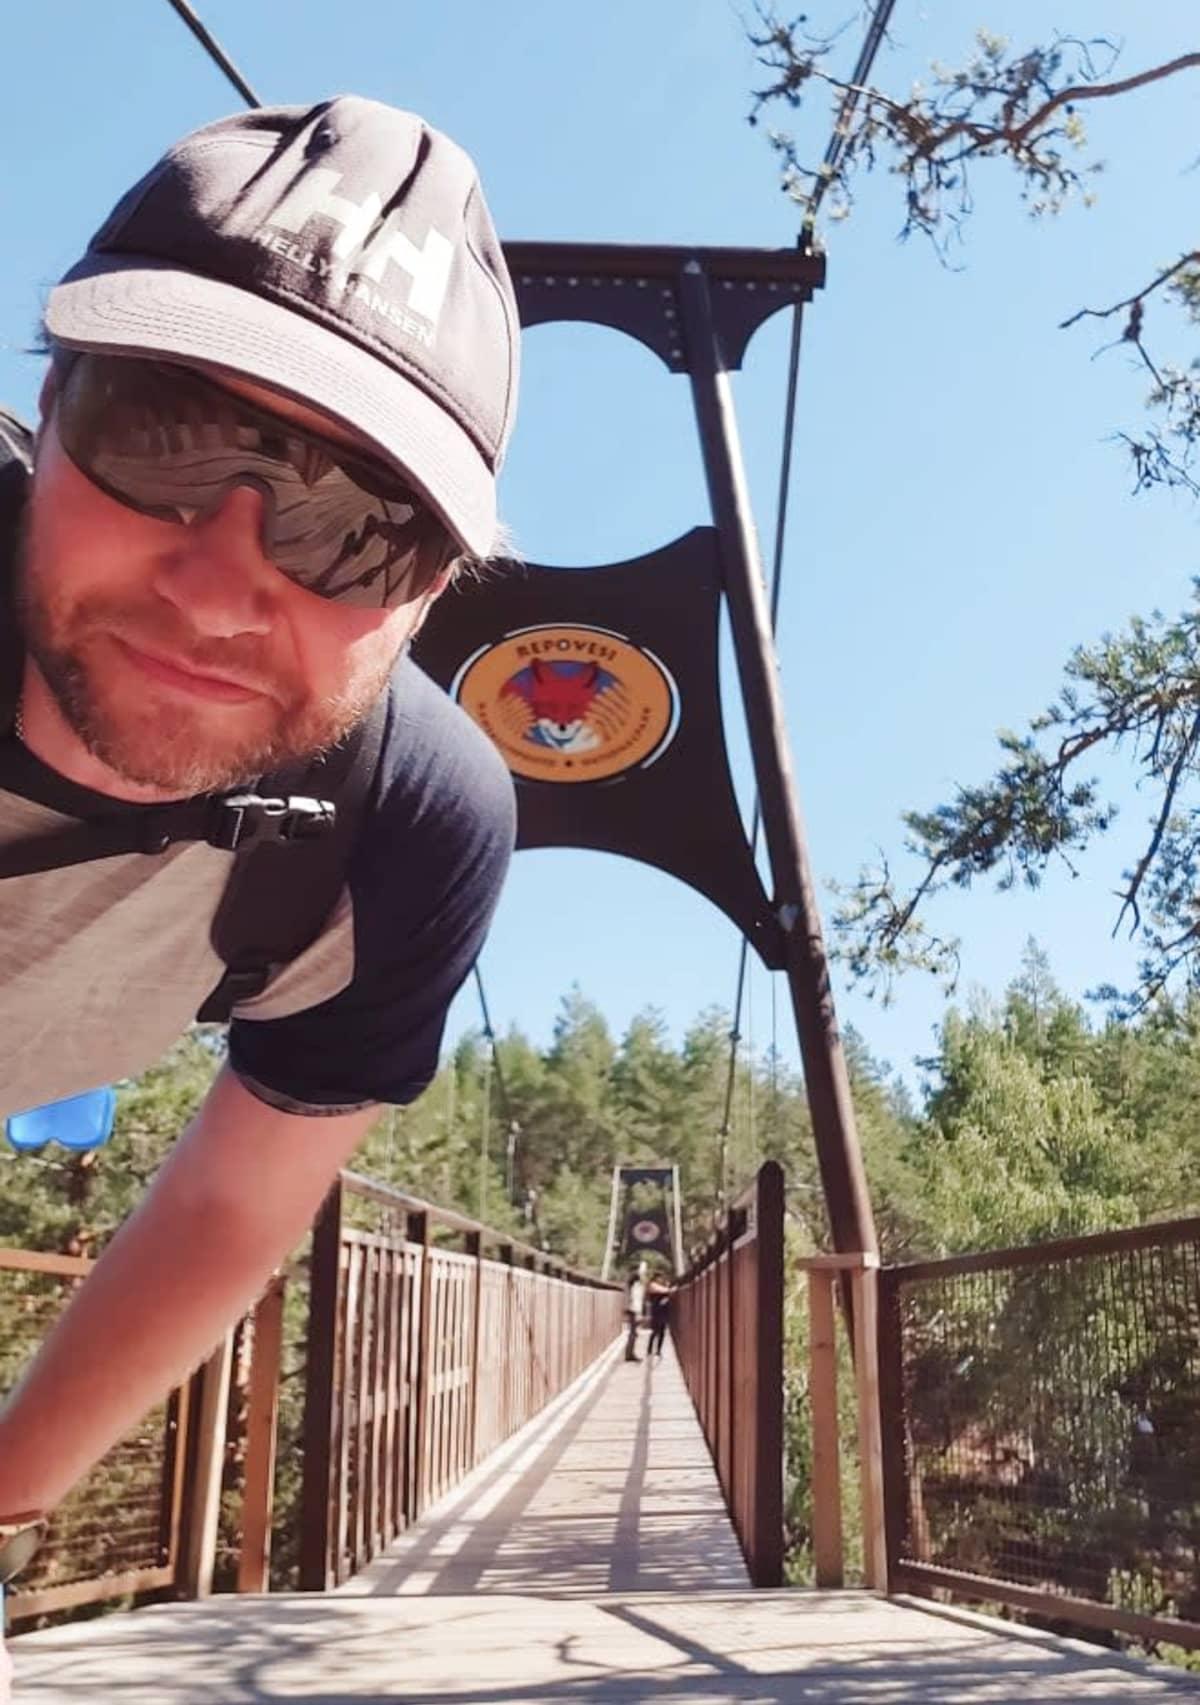 Mies katsoo kameraan Repoveden sillan luona.